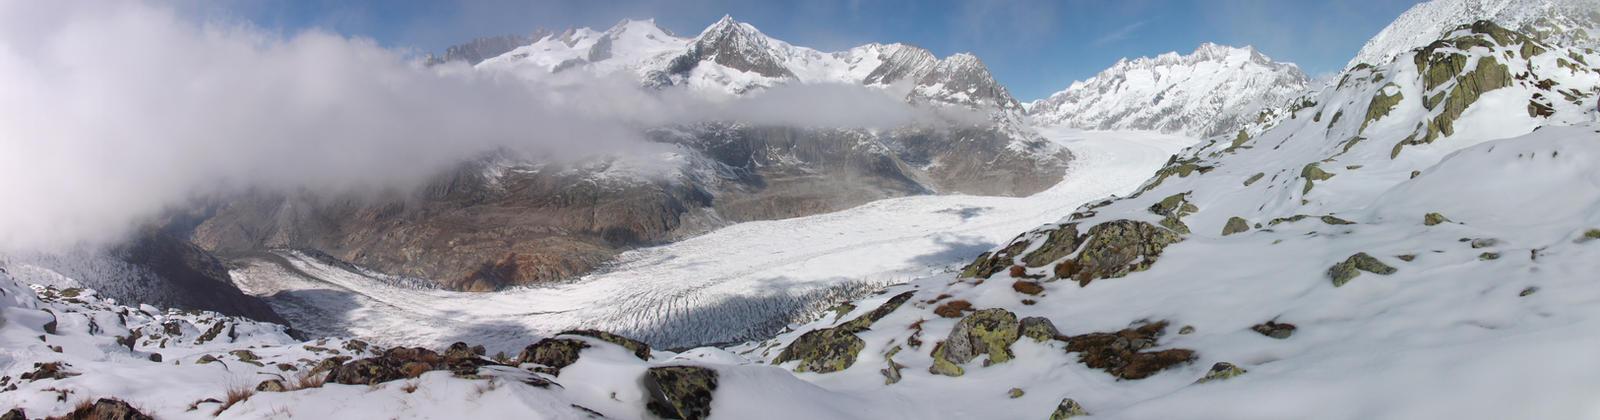 Grosser Aletschgletscher by Azifri